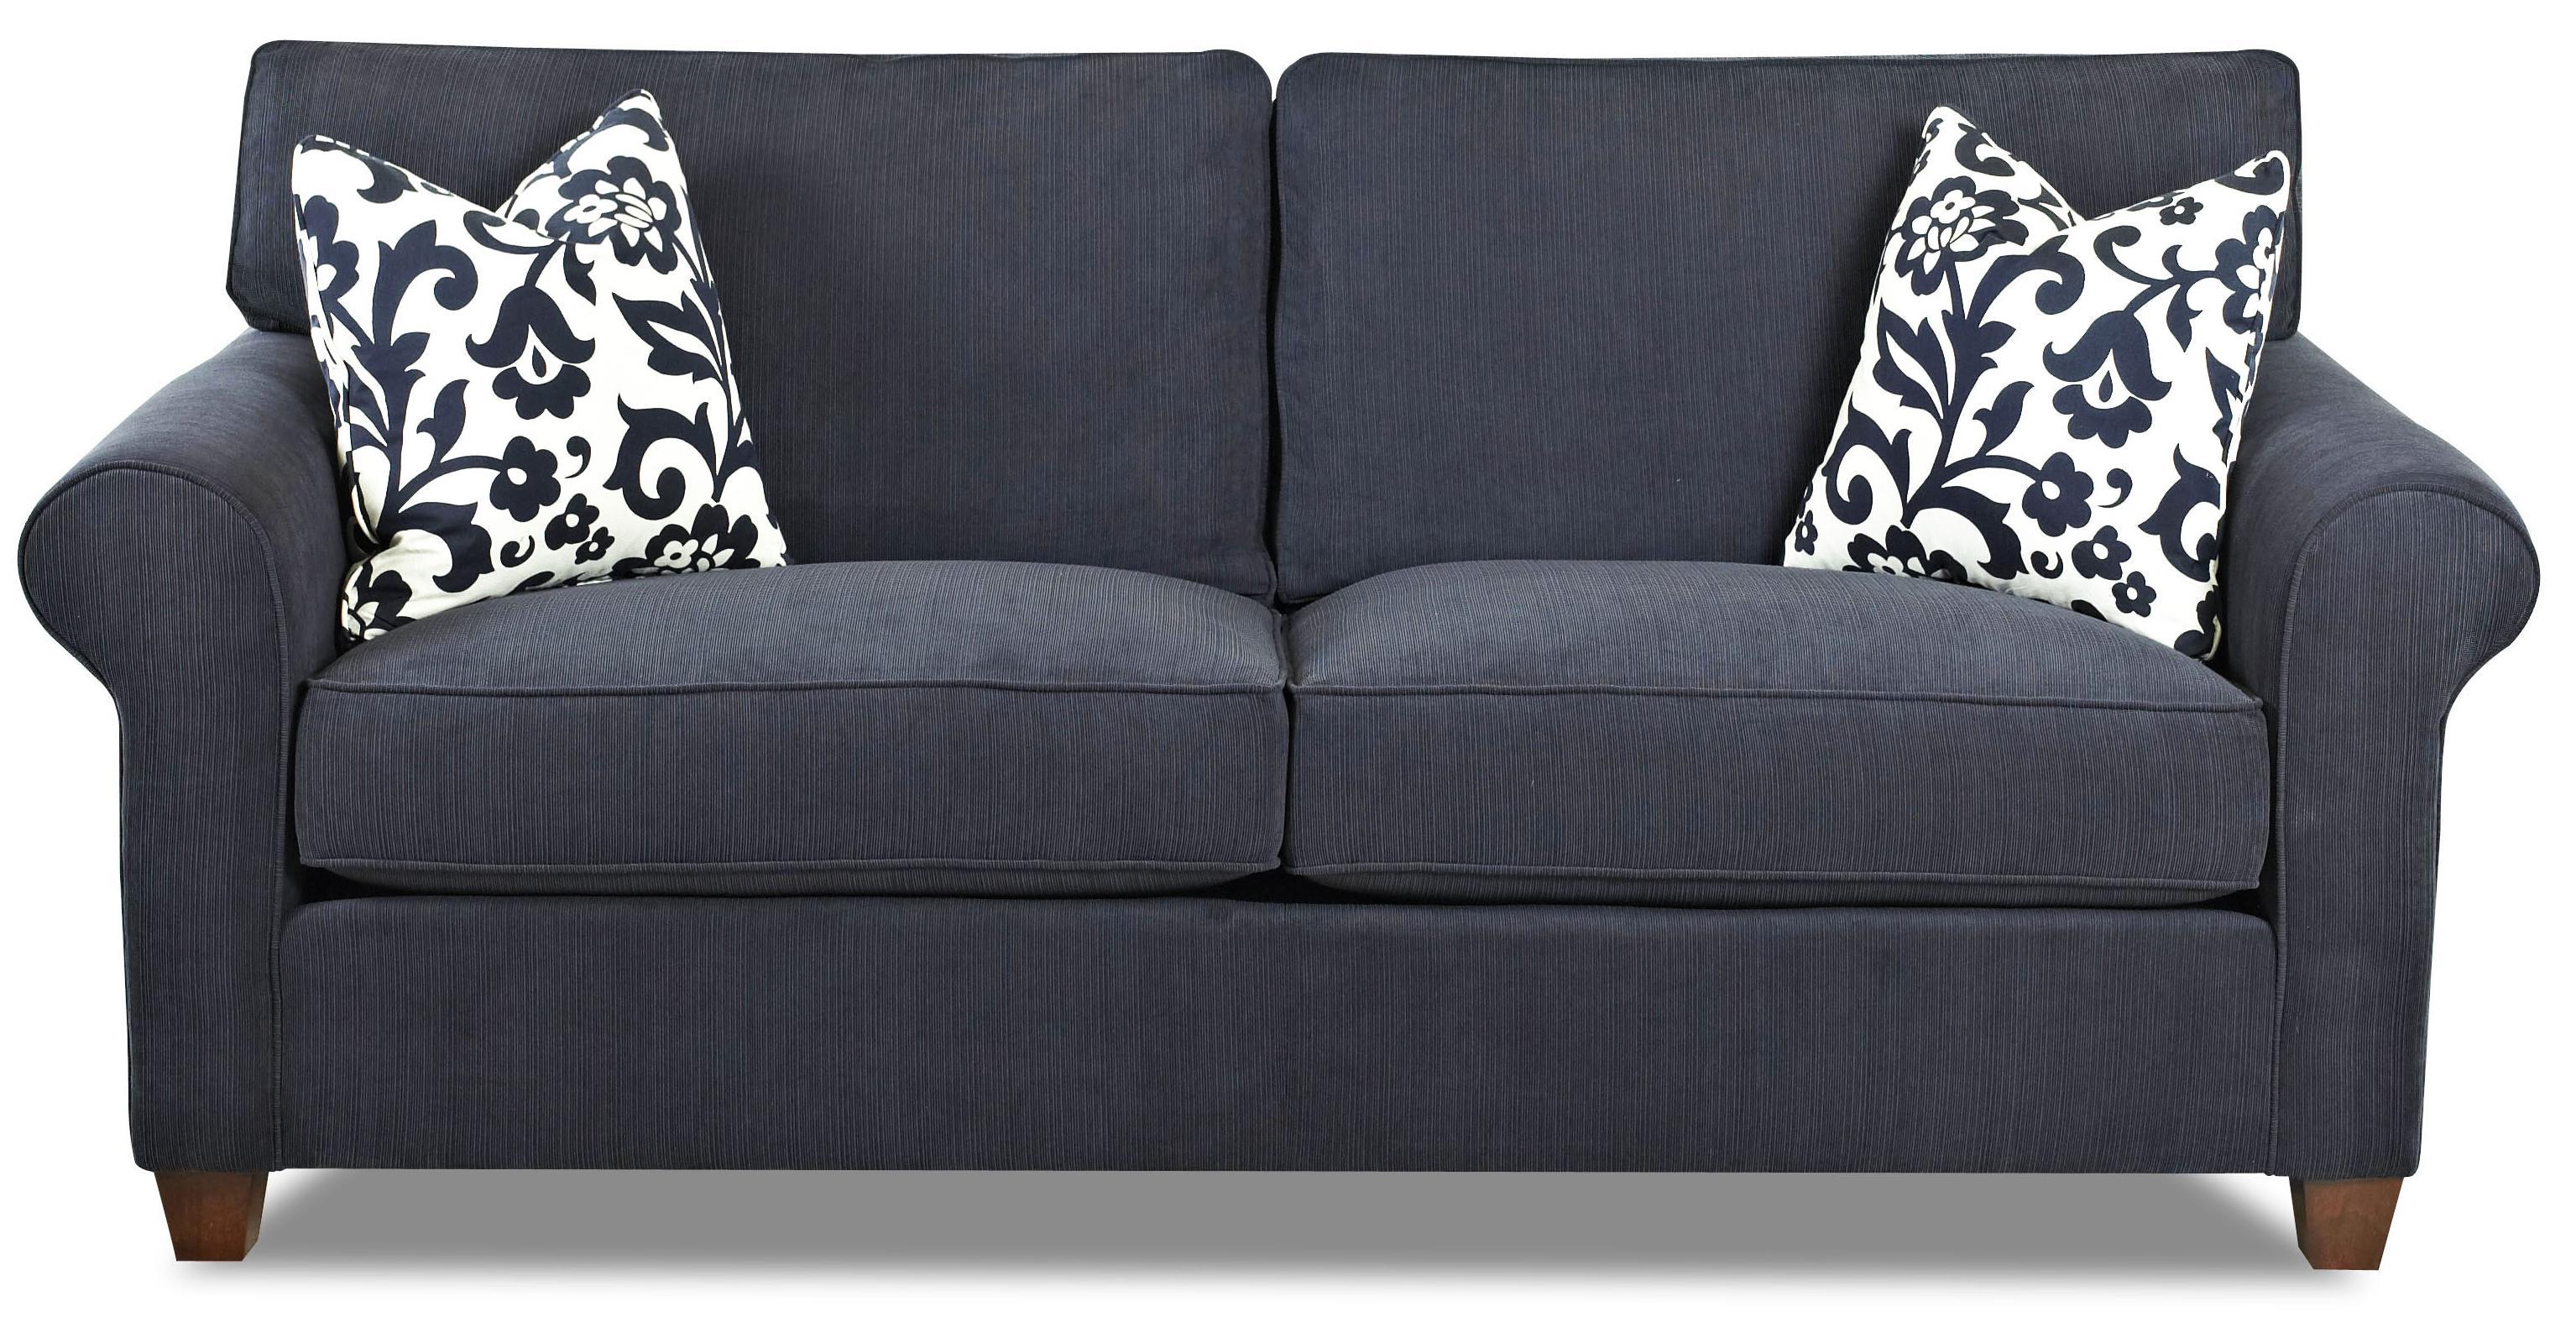 Klaussner Lillington Distinctions  Stationary Sofa - Item Number: D70200-S